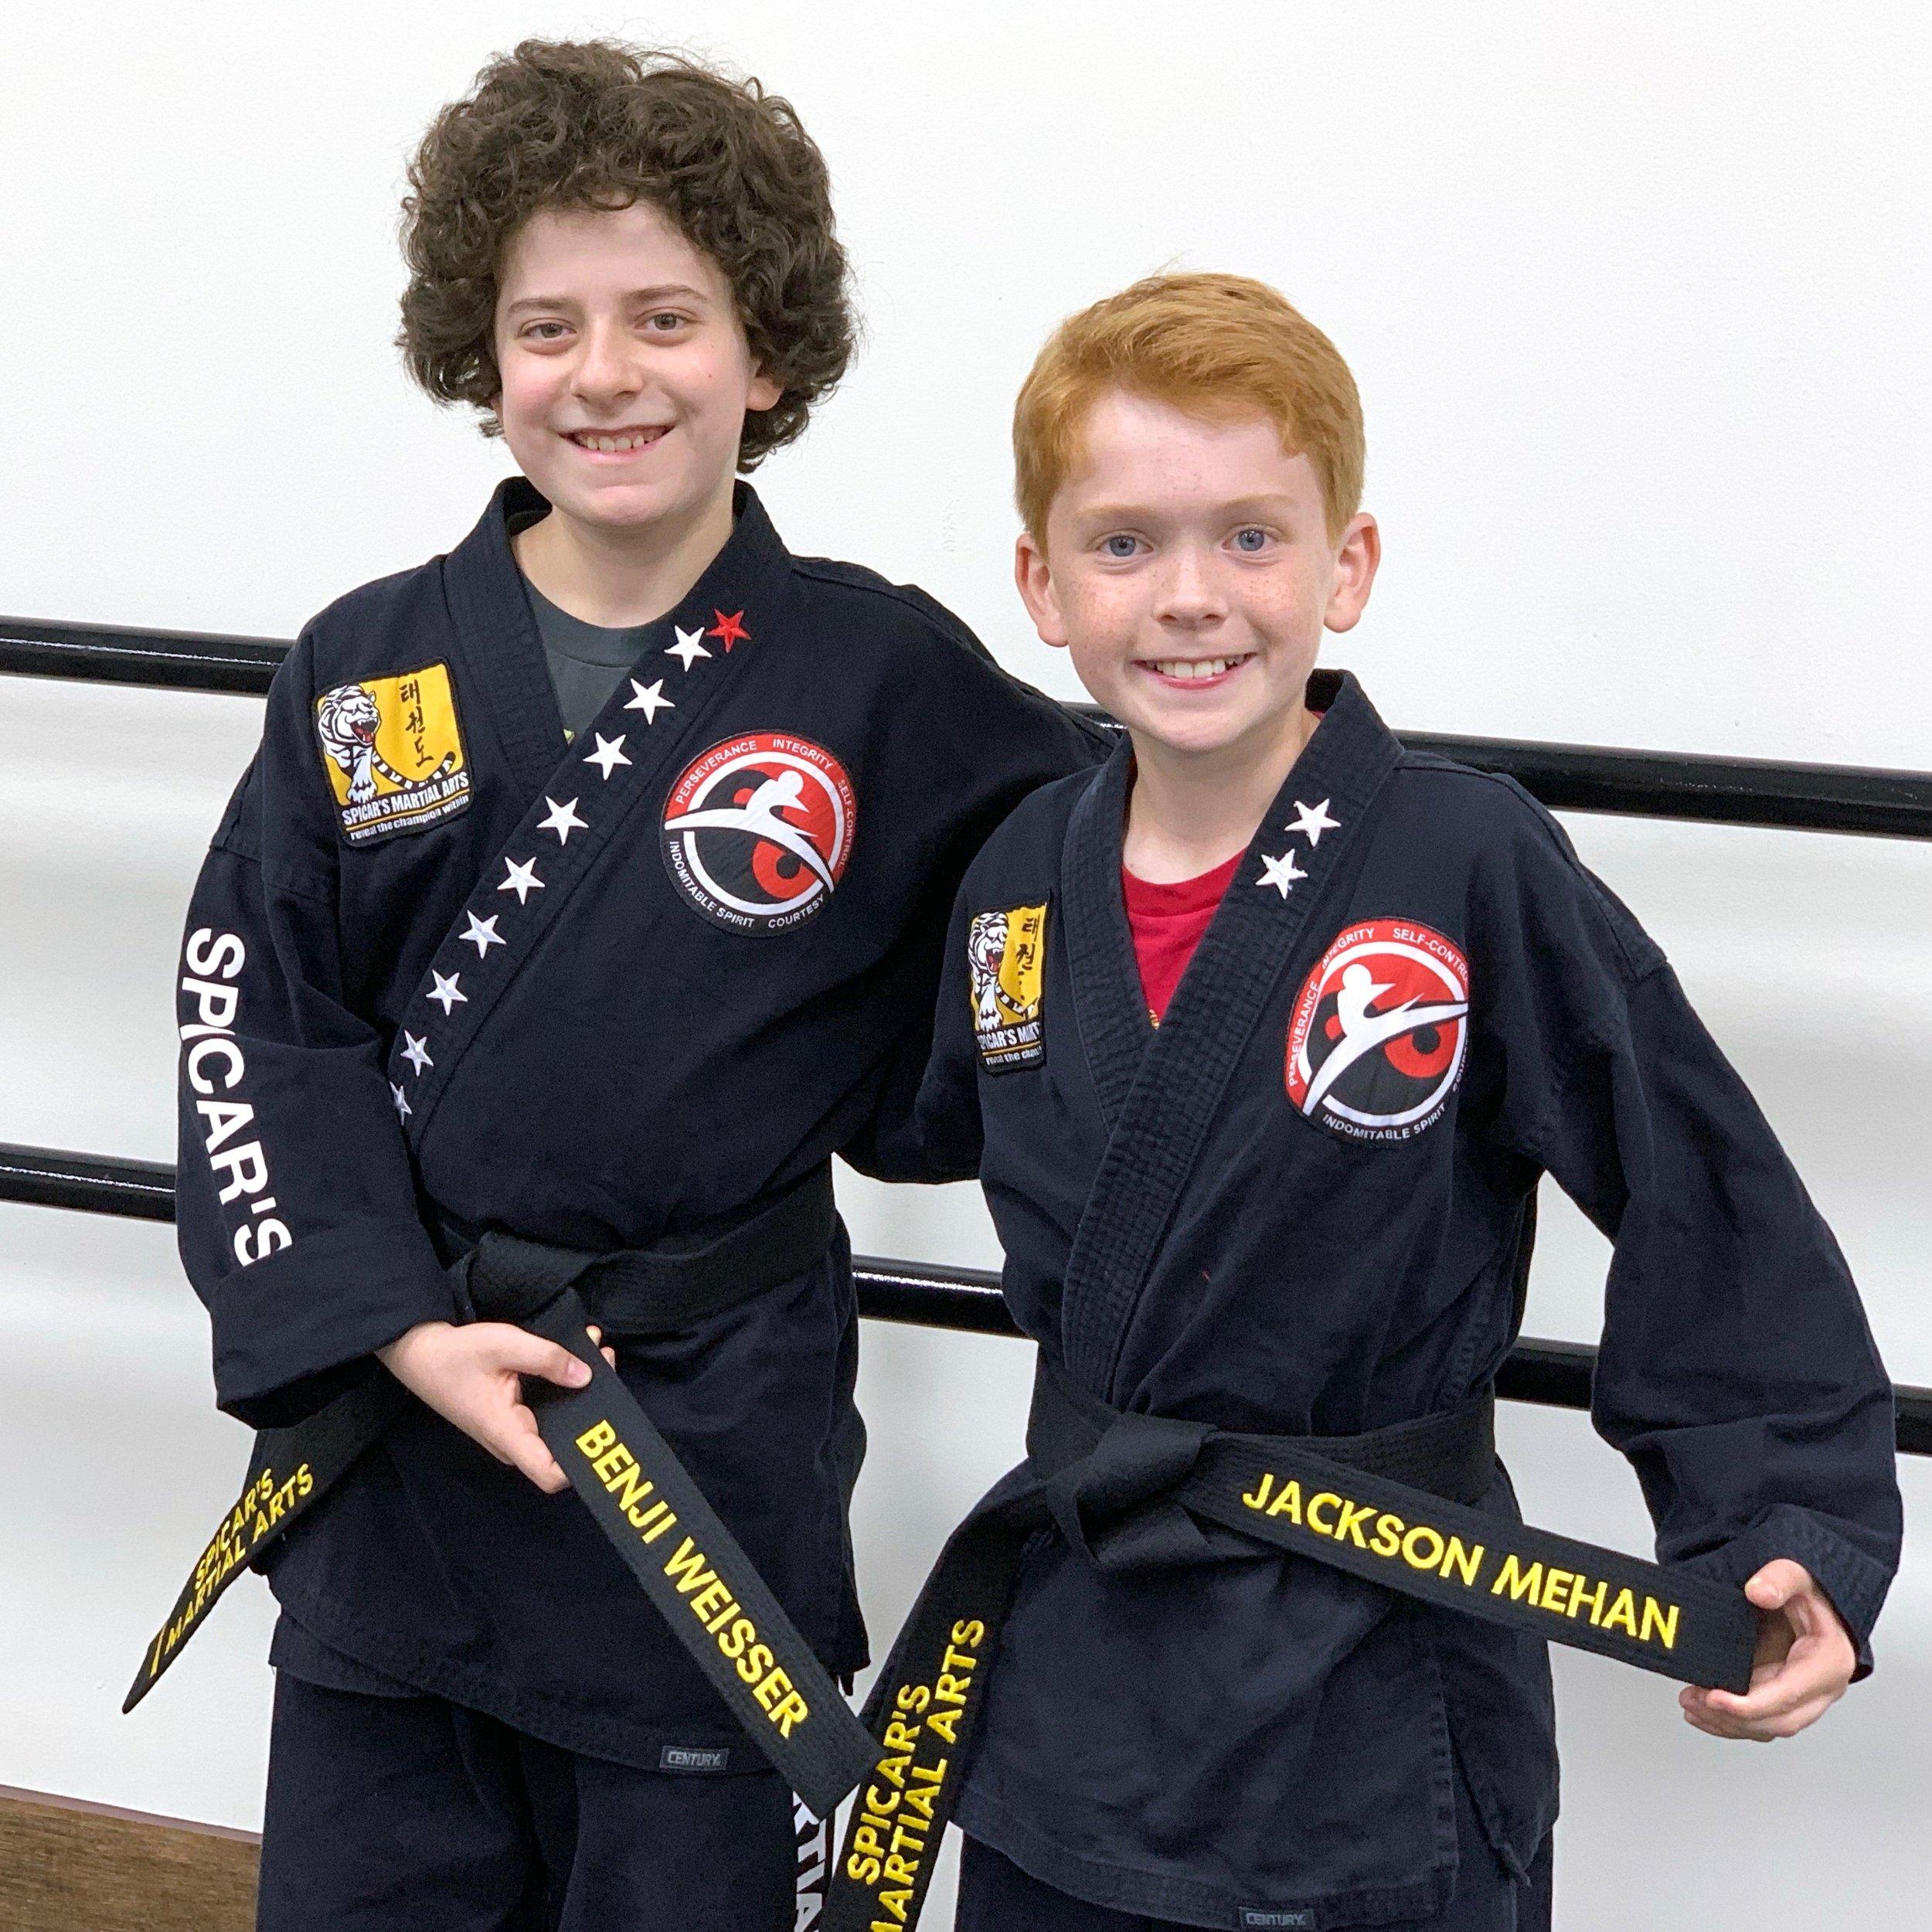 karate-kids-program-souhtlake-keller-grapevine-texas00059.jpeg